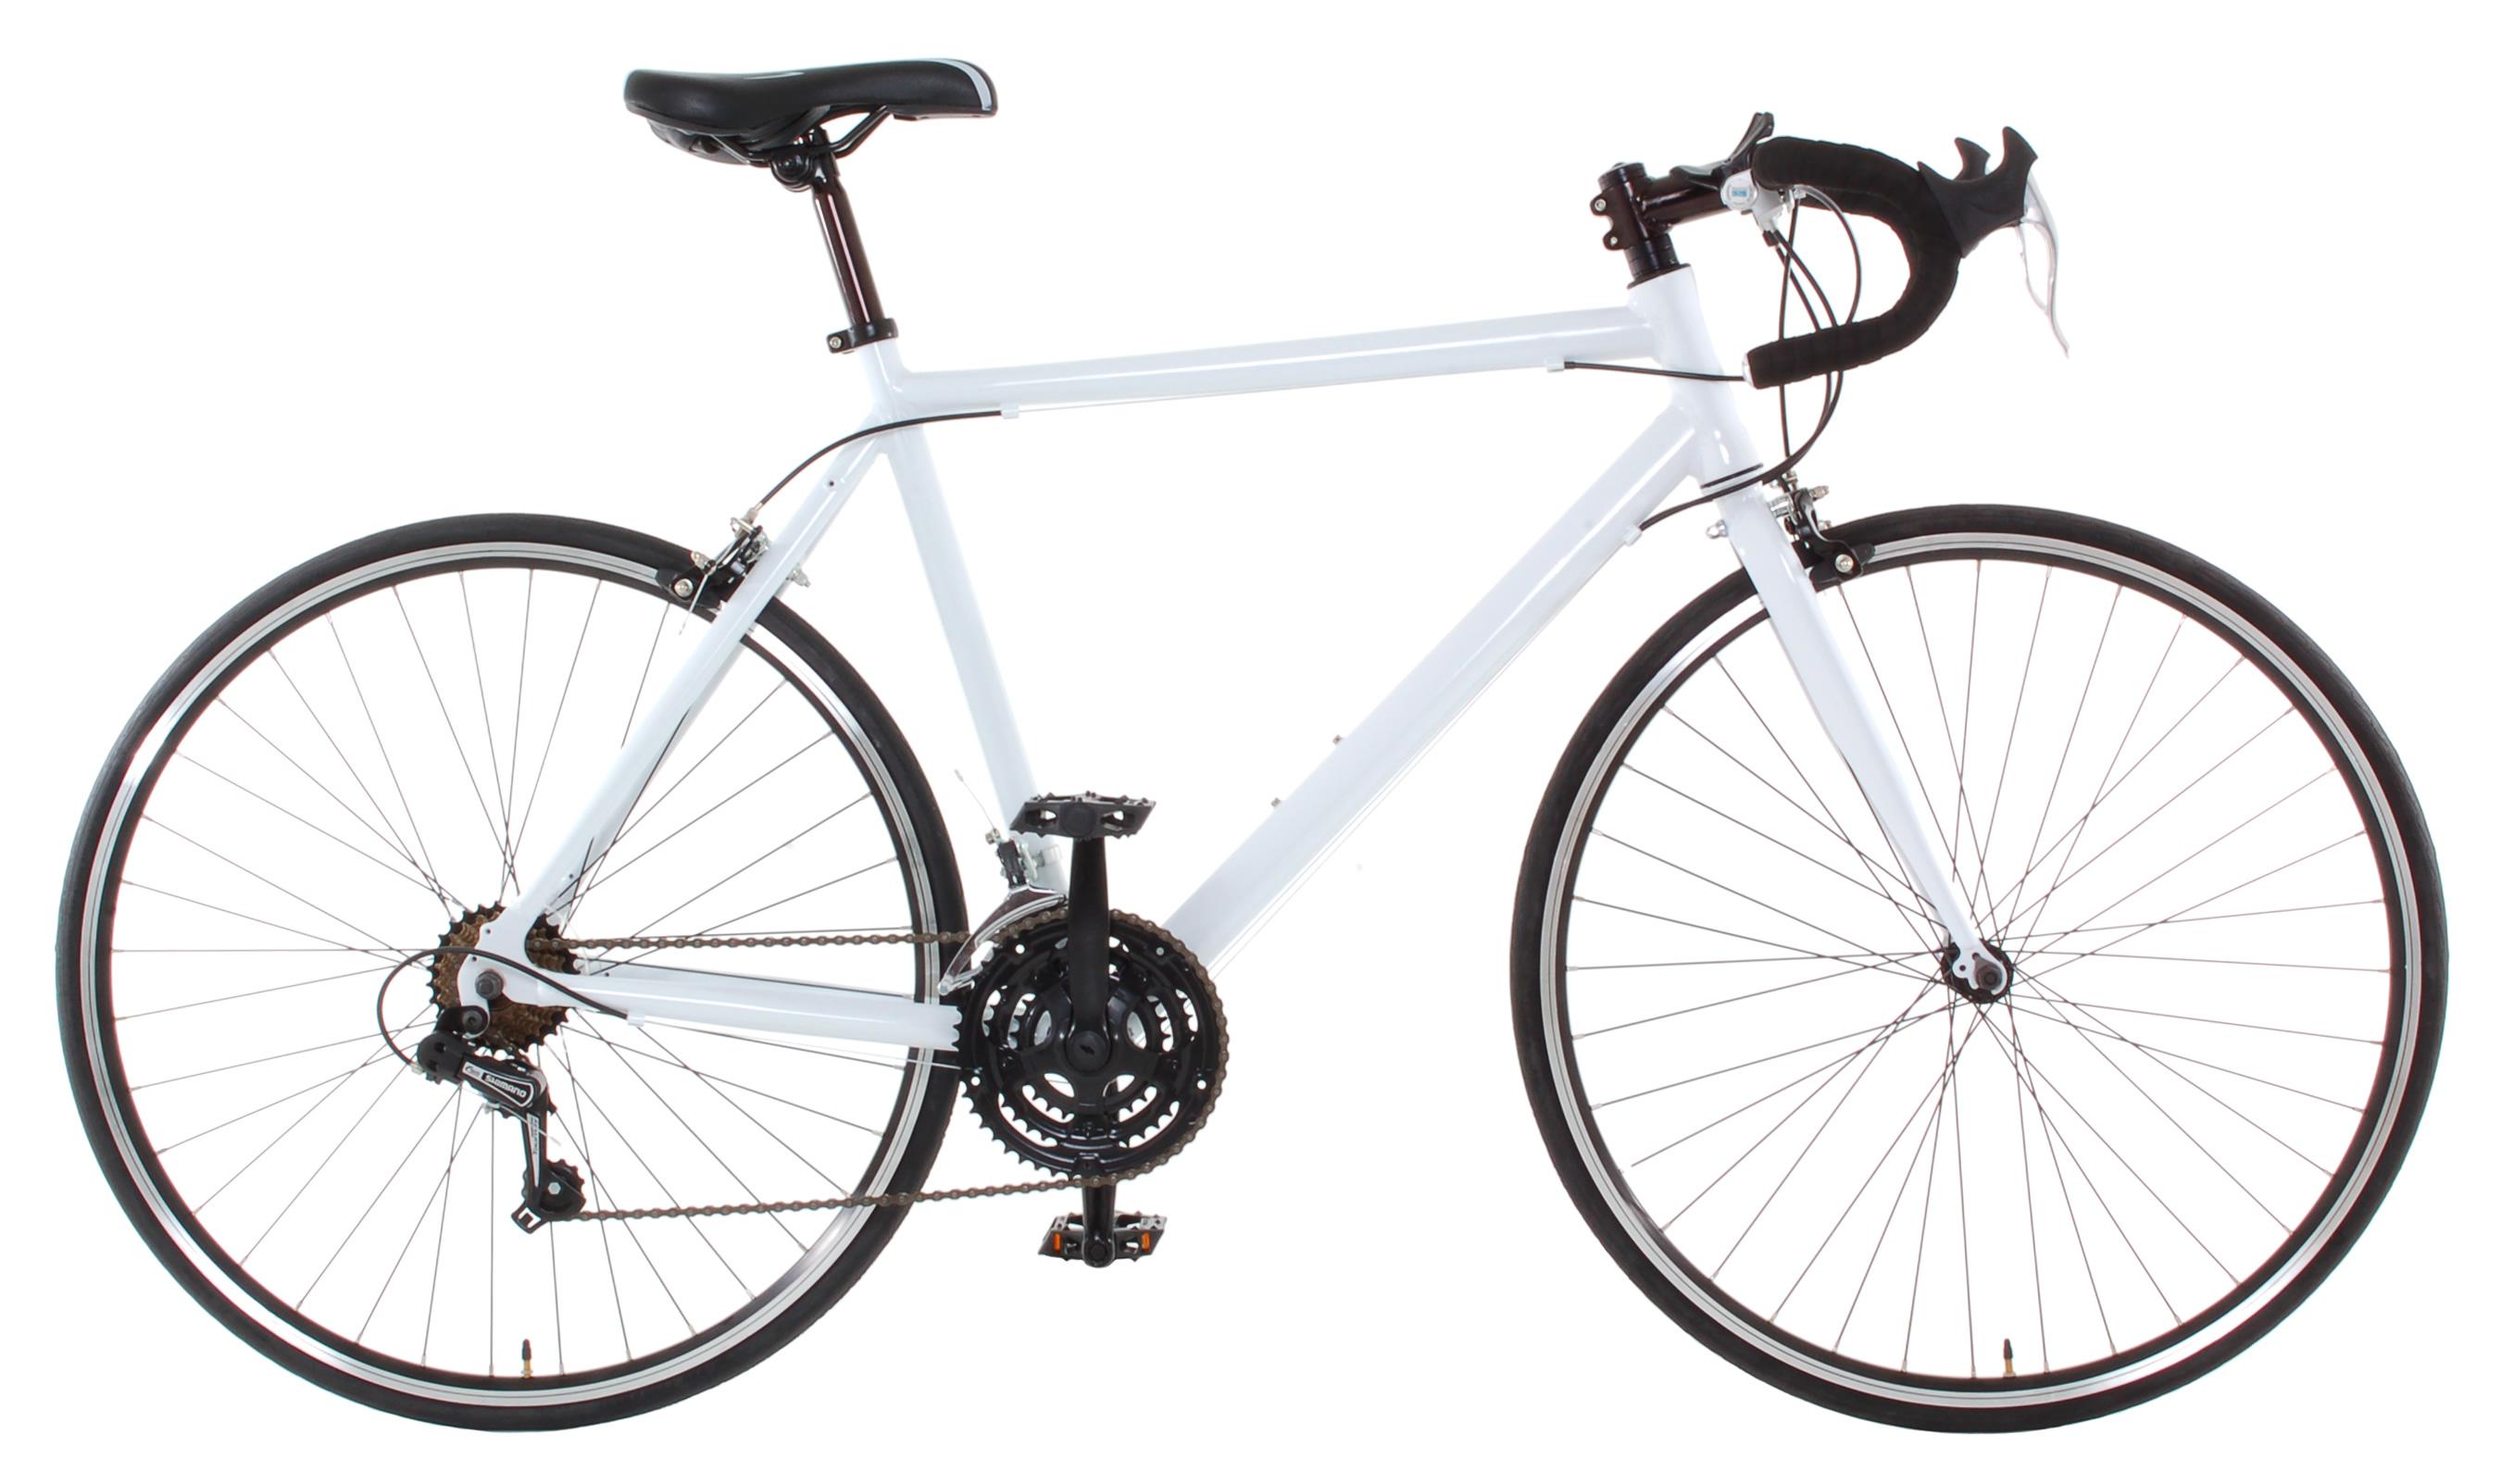 Vilano-Aluminum-Road-Bike-Commuter-Bike-Shimano-21-Speed-700c